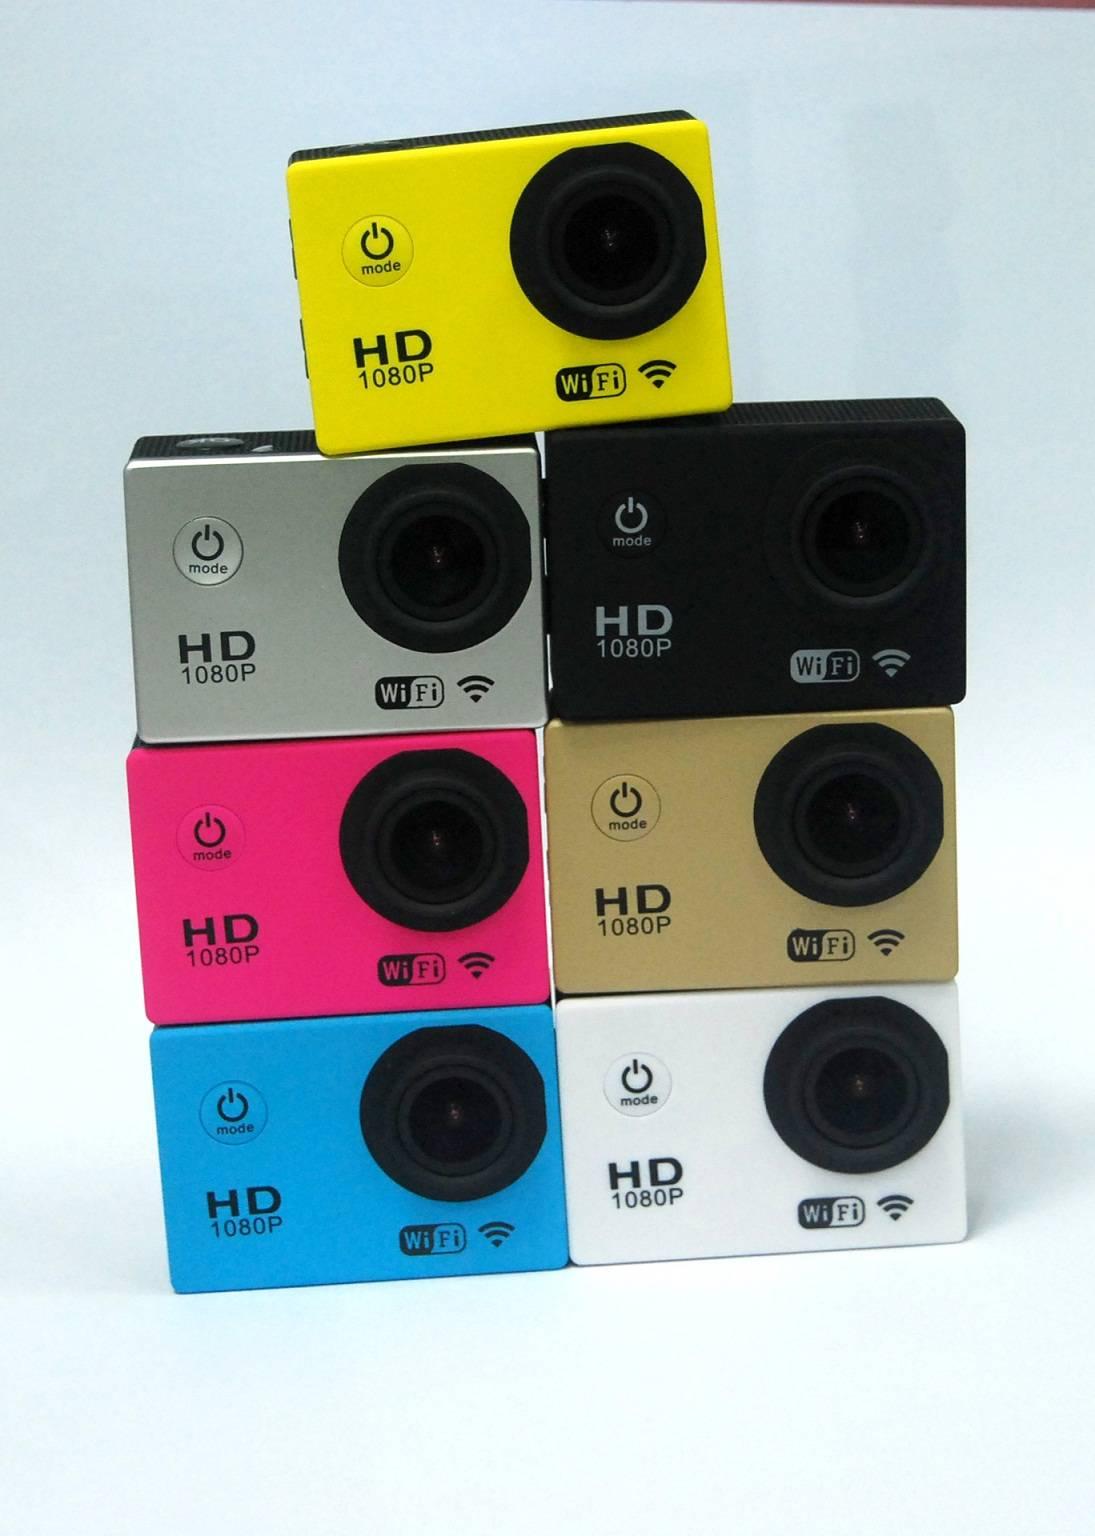 Original Sj4000 WiFi Waterproof Sports DV Full HD Helmet Camera Camcorder Gopro Style 1080P12MP H264